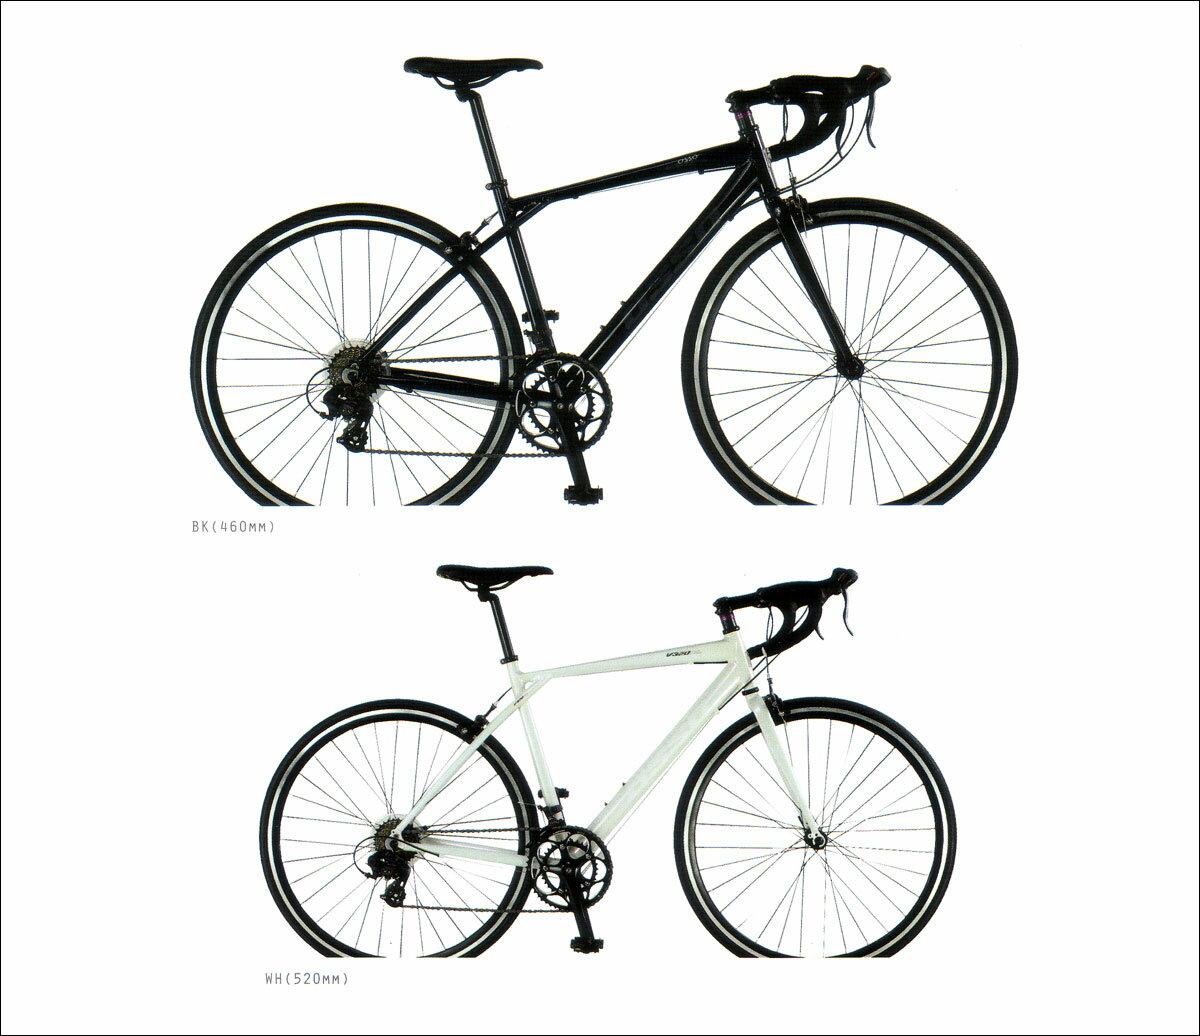 OSSO(オッソ) V320-AL【ロードバイク/ROAD】【運動/健康/美容】 OSSO(オッソ) V320-AL【ロードバイク/ROAD】